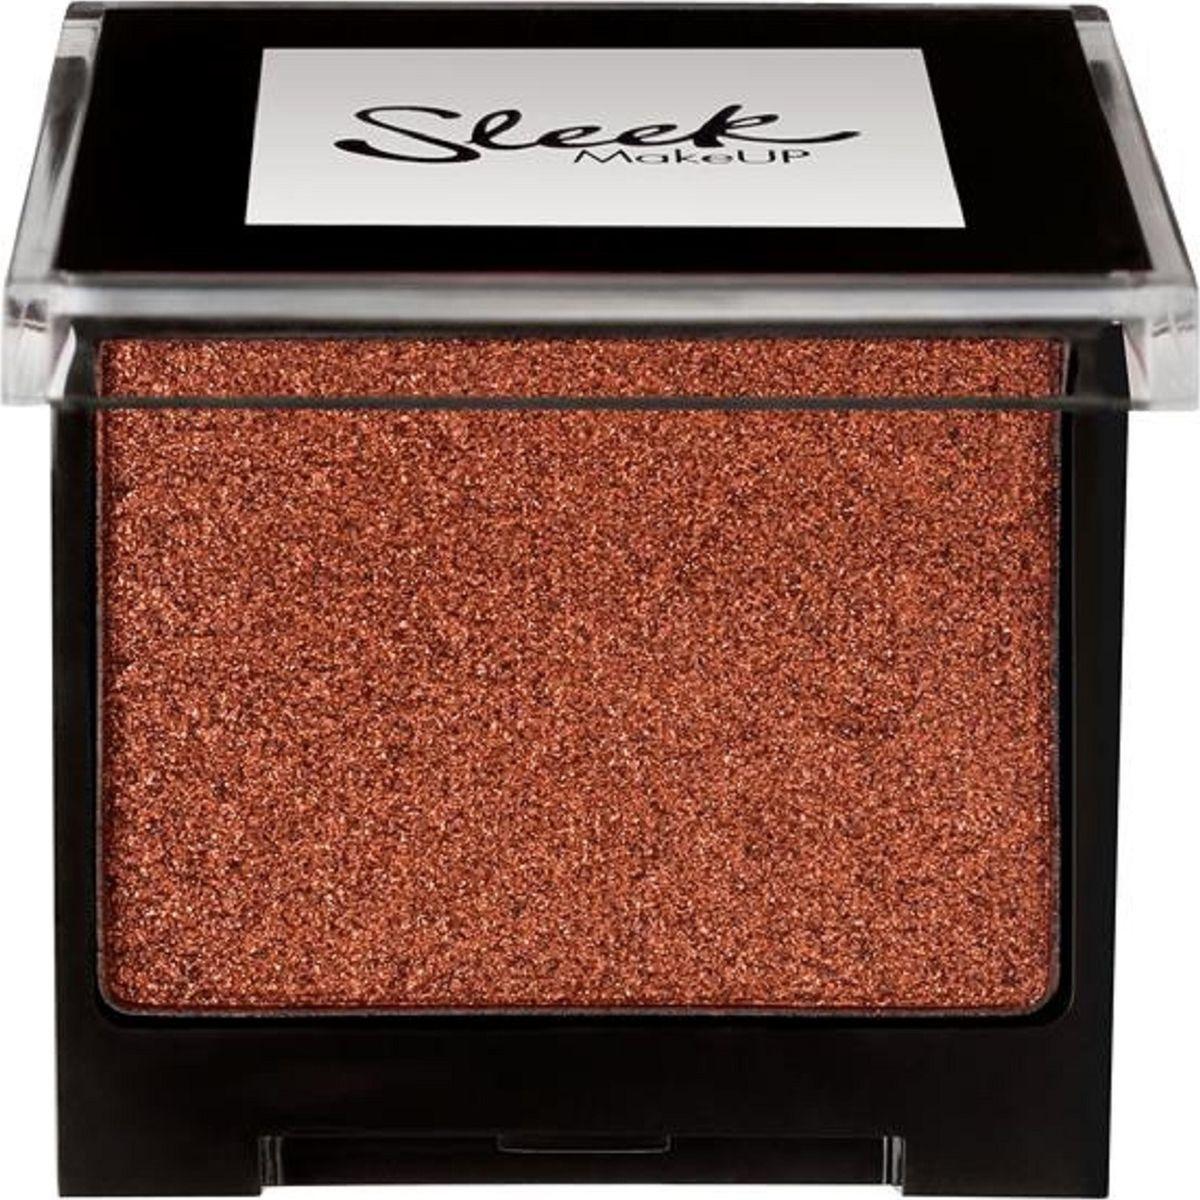 Тени для век Sleek MakeUP Mono Eyeshadow Stubborn 1273, 11,5 г все цены